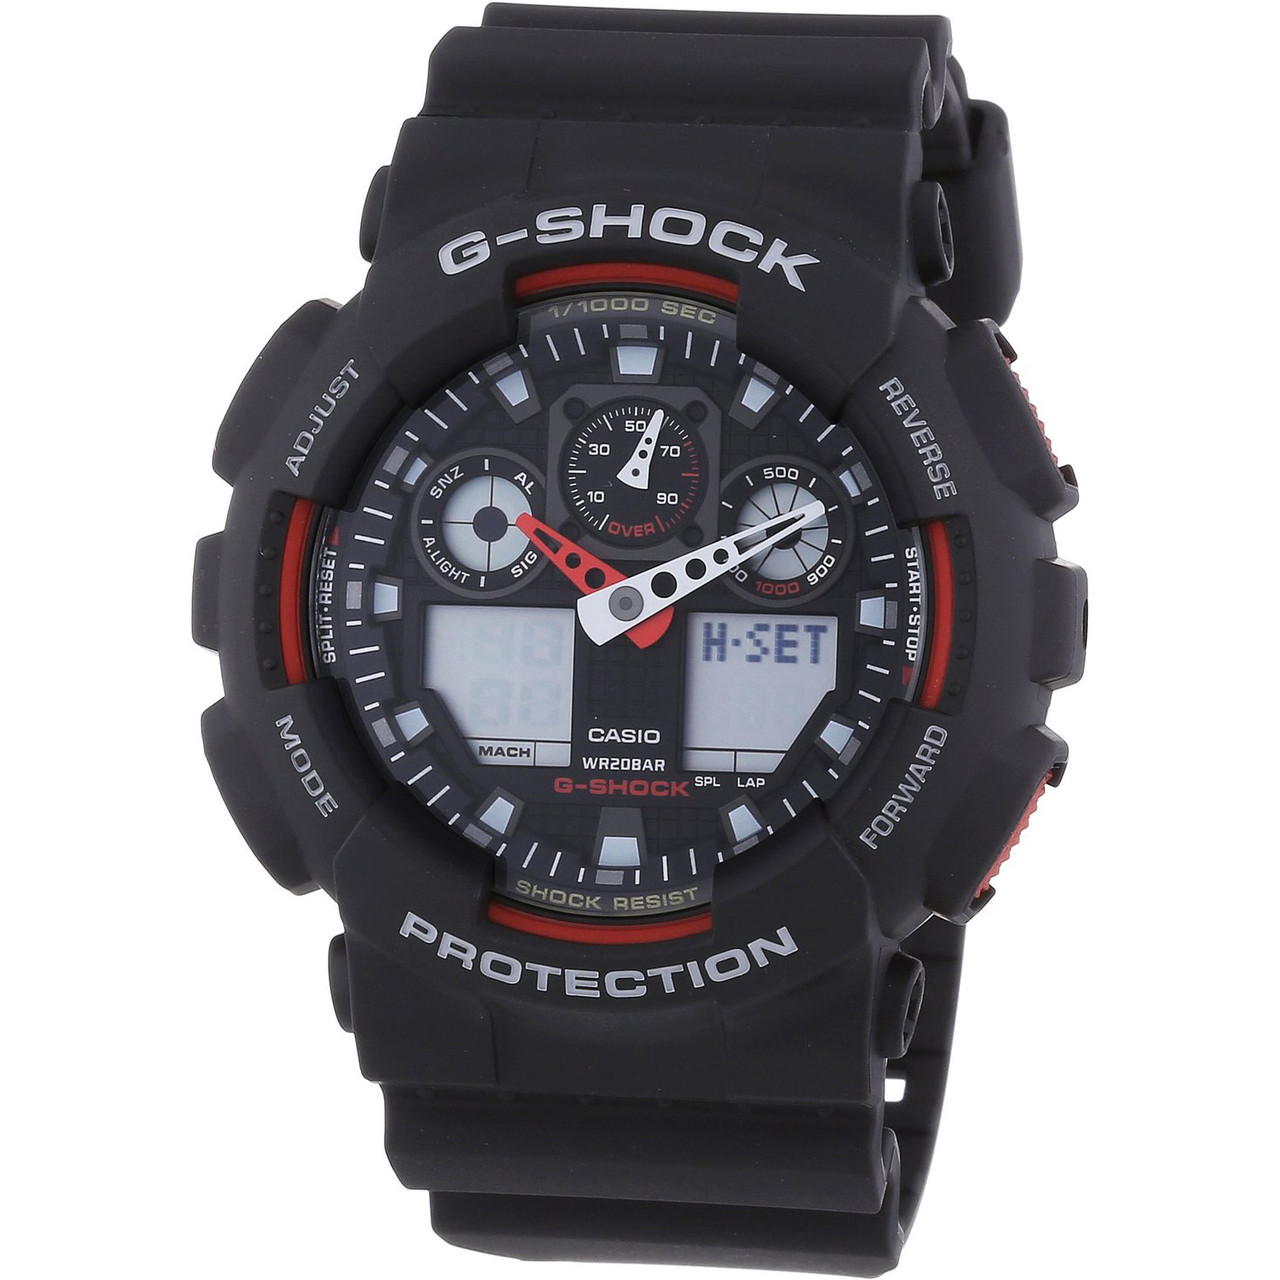 fdfcedf8840 G-Shock Analog Digital World-Time Black Watch GA-100-1A4ER